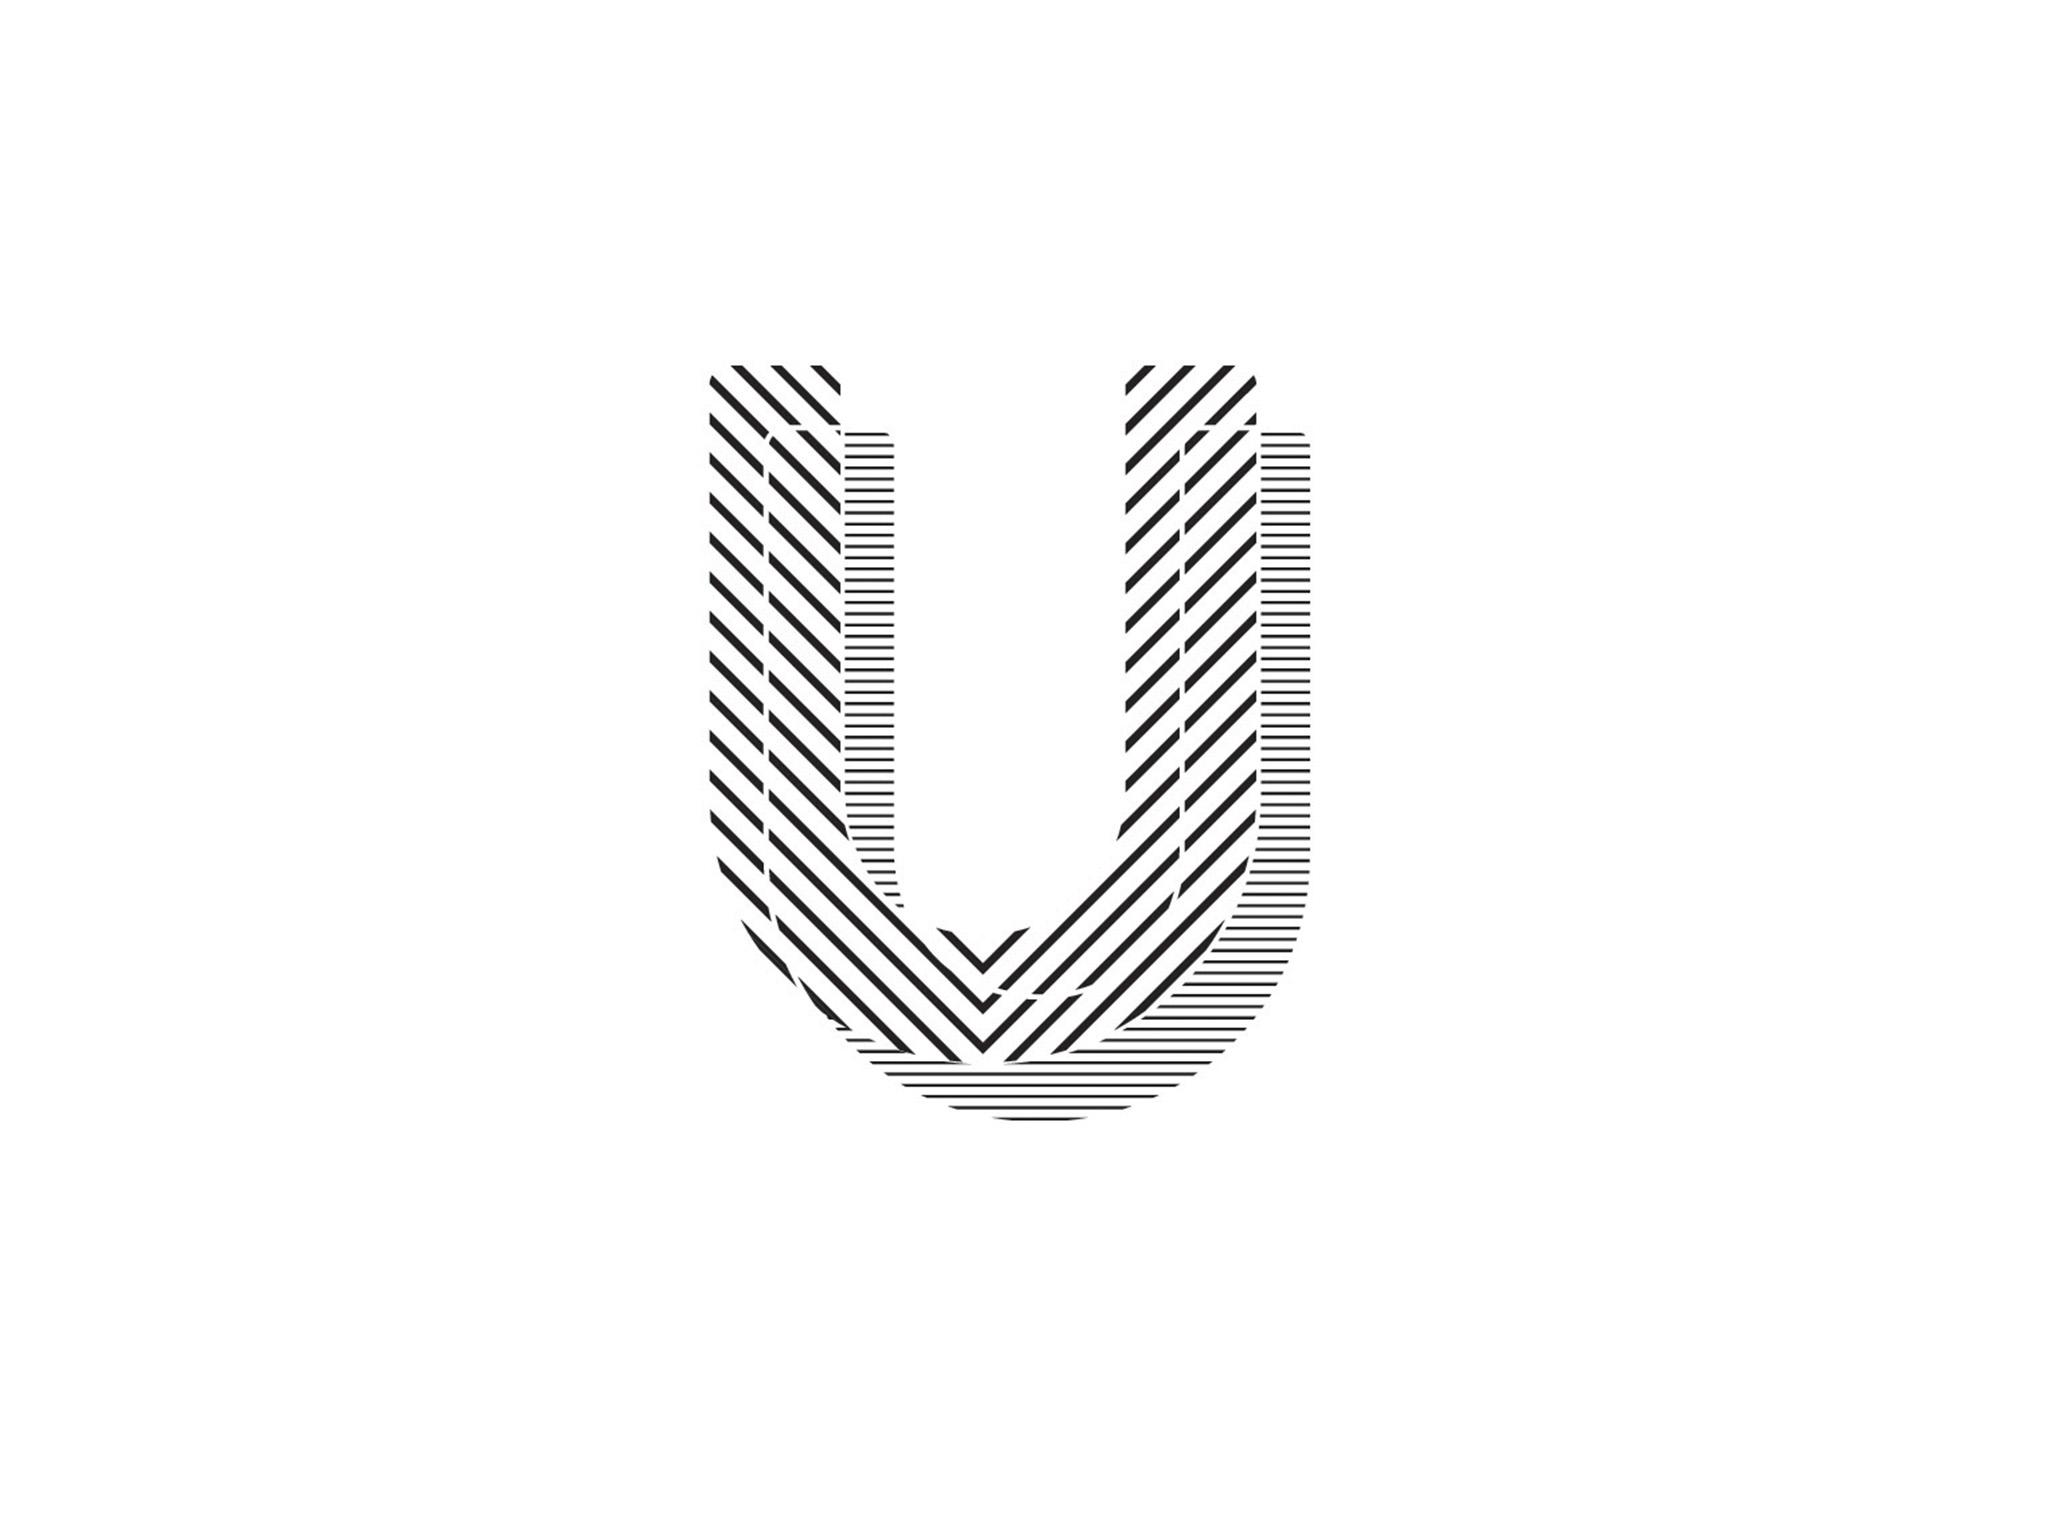 apex_letters_horizontal_large_0035_2_final_alphabet coasters-21.jpg